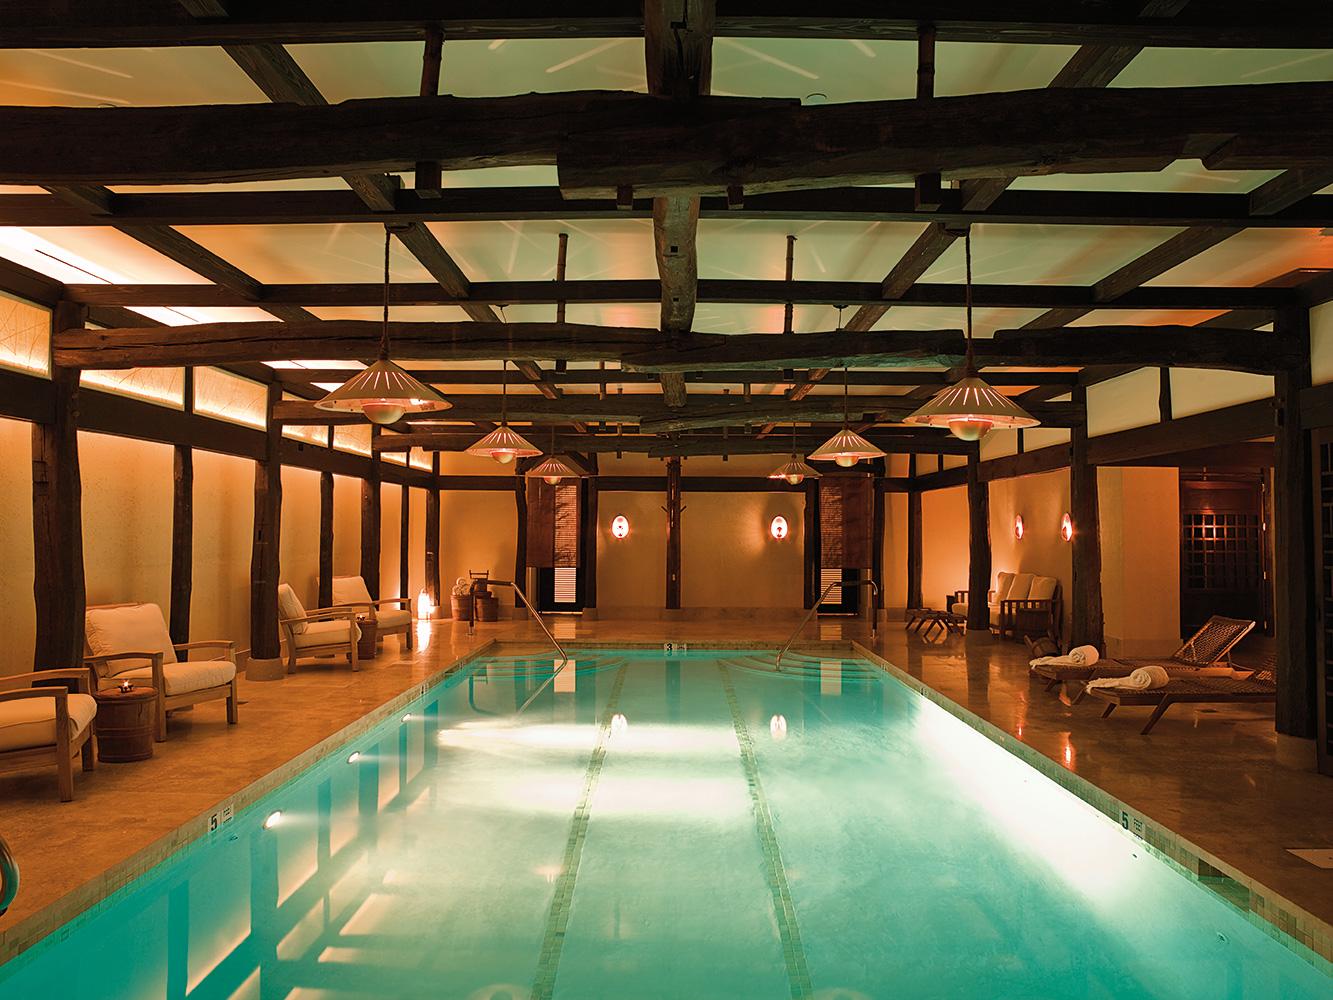 greenwich-hotel-Pool-Long-Shot-High.jpg